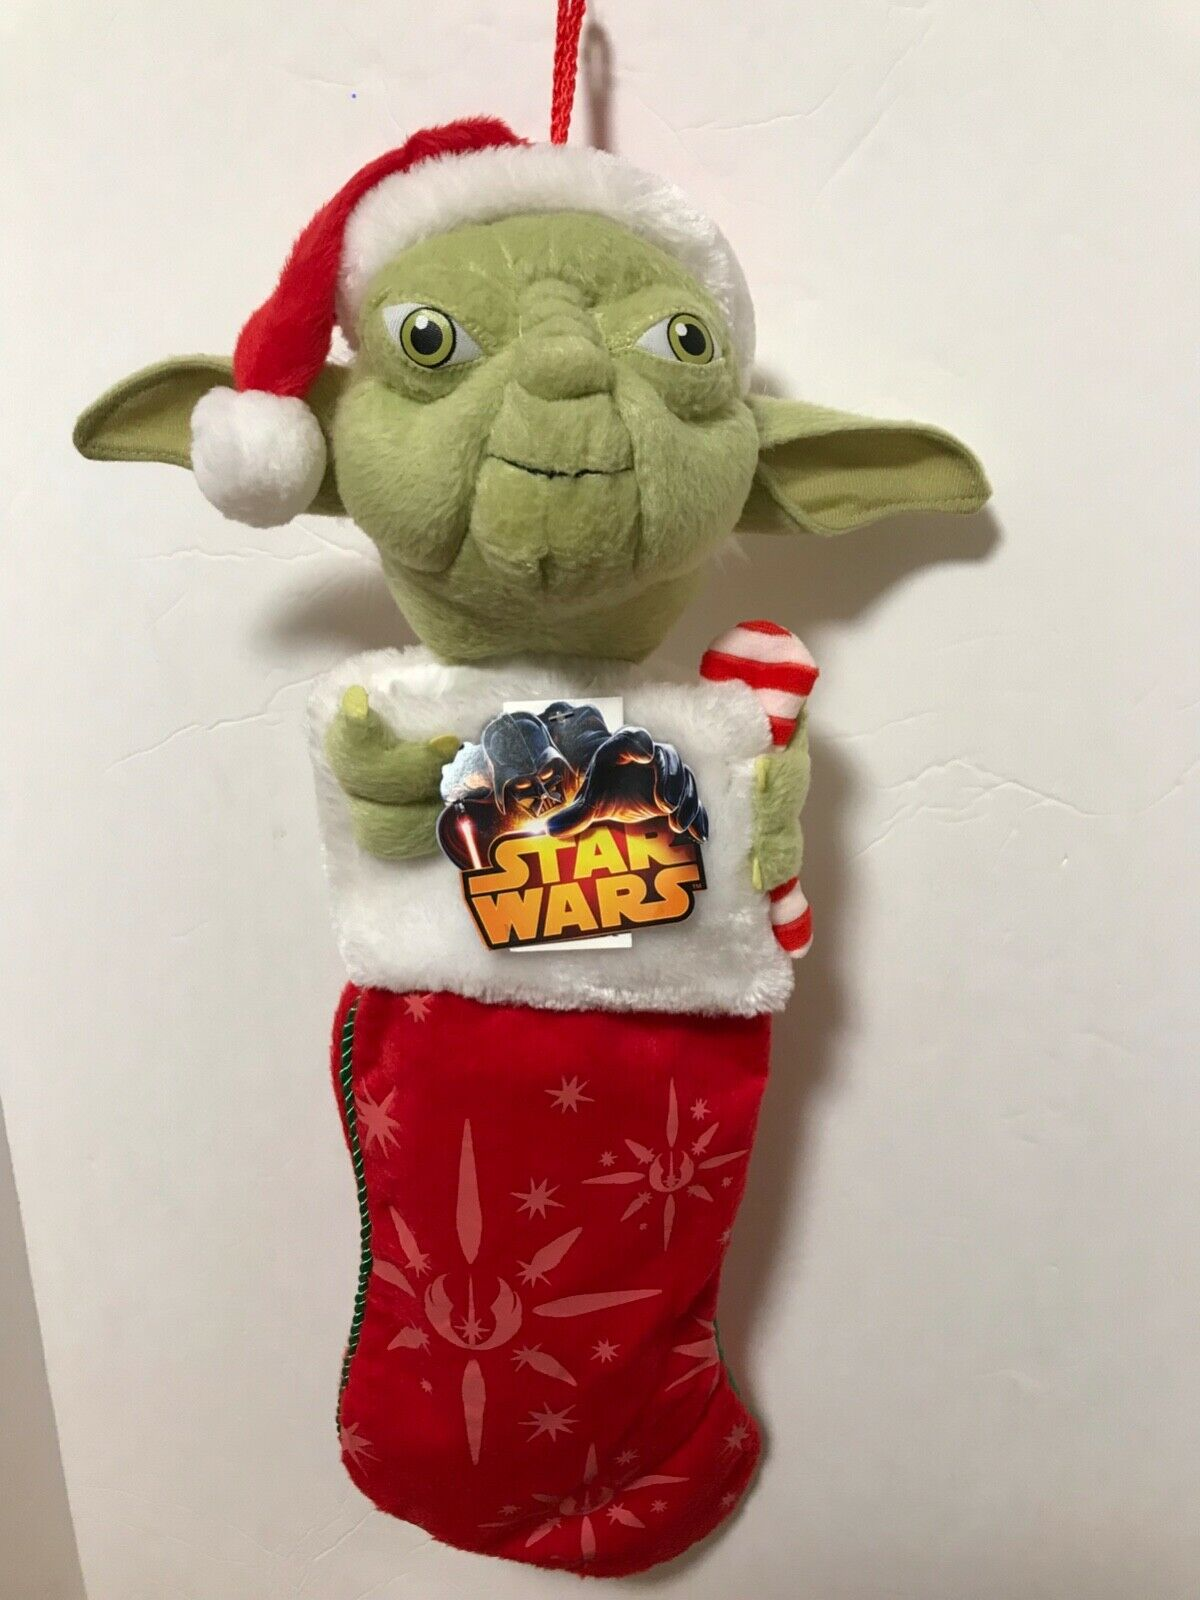 Star Wars Yoda Christmas Stocking